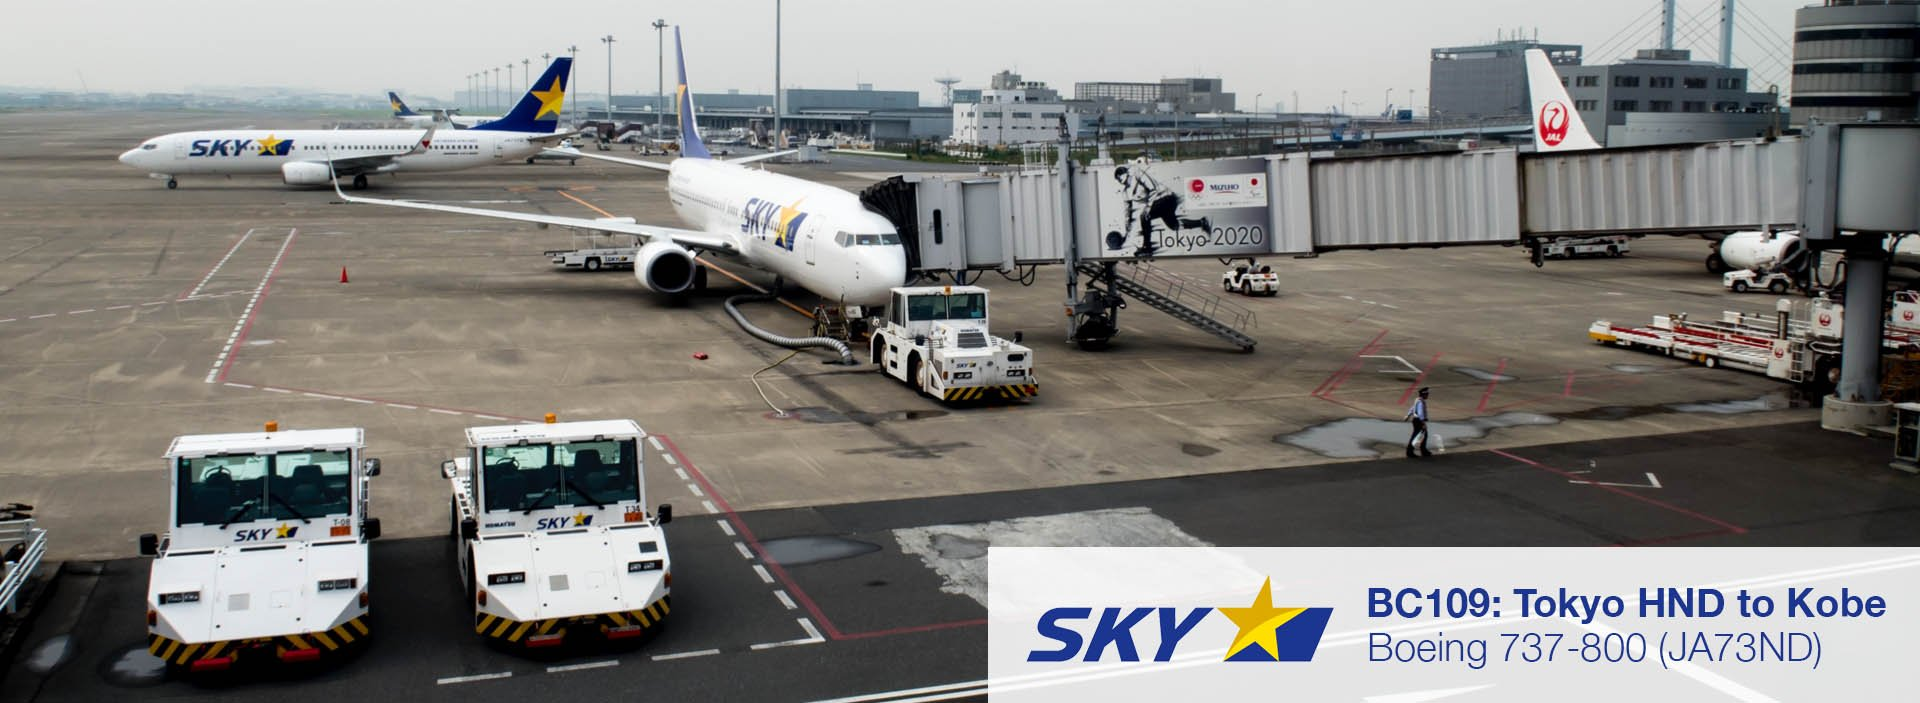 Flight Report: Skymark Airlines 737-800 from Tokyo HND to Kobe